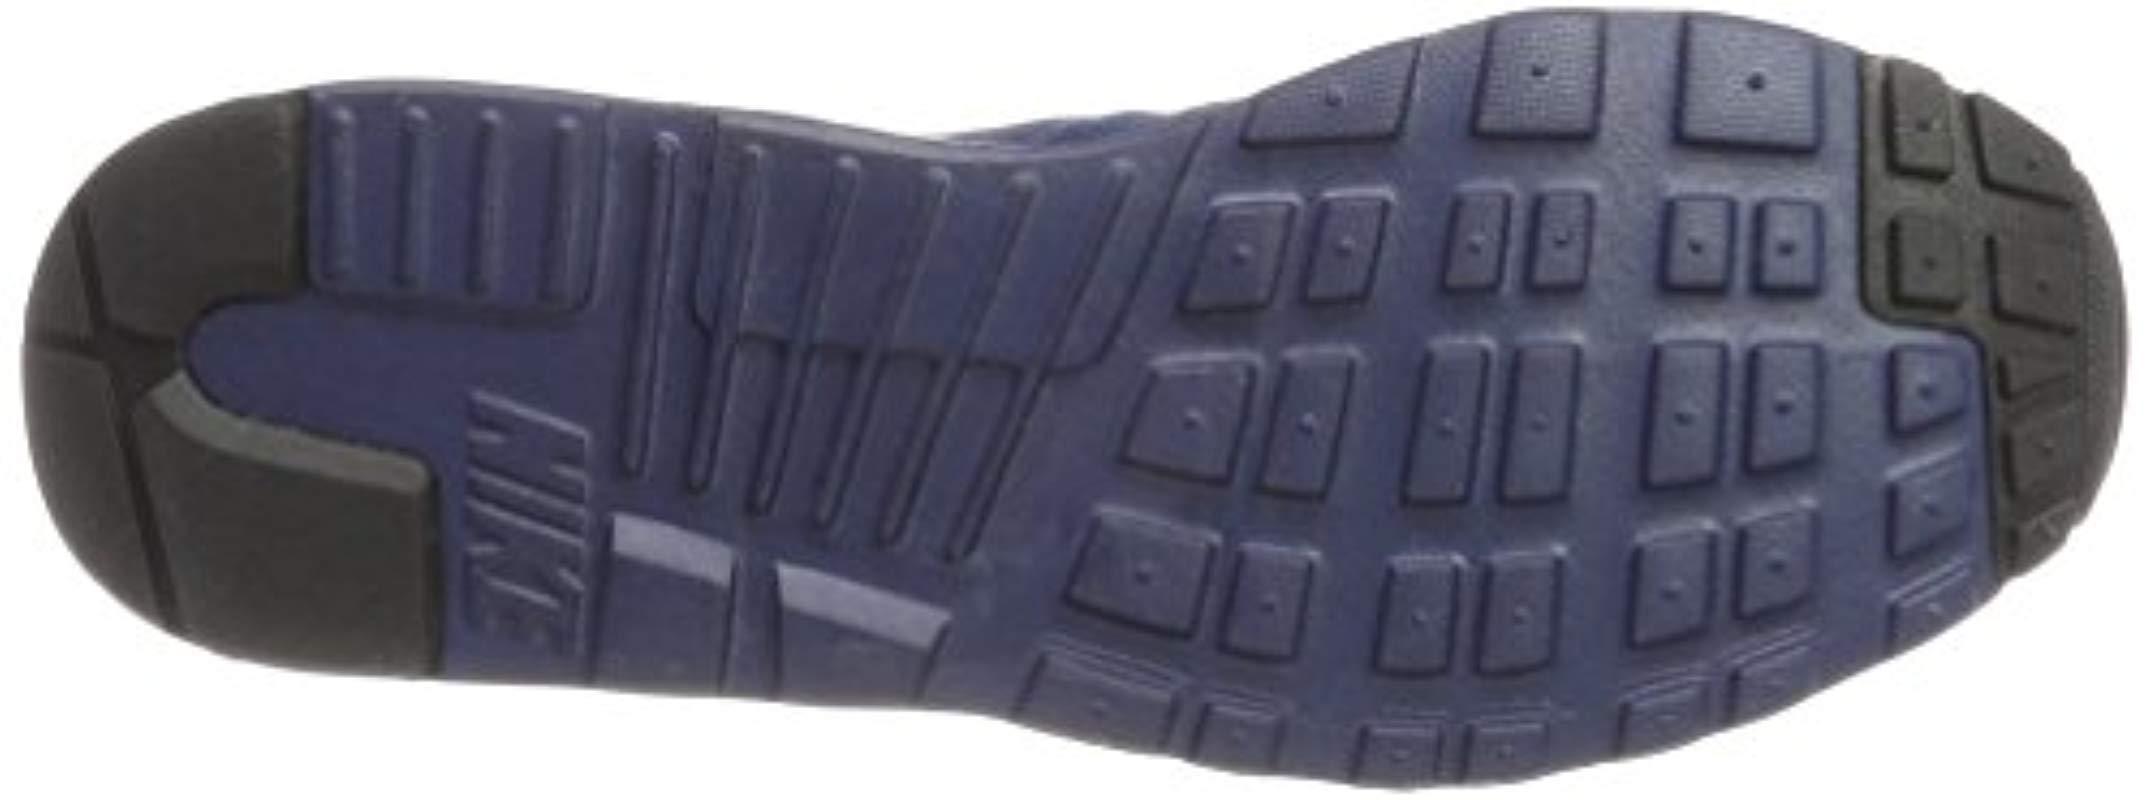 adidas zx flux uomo 455